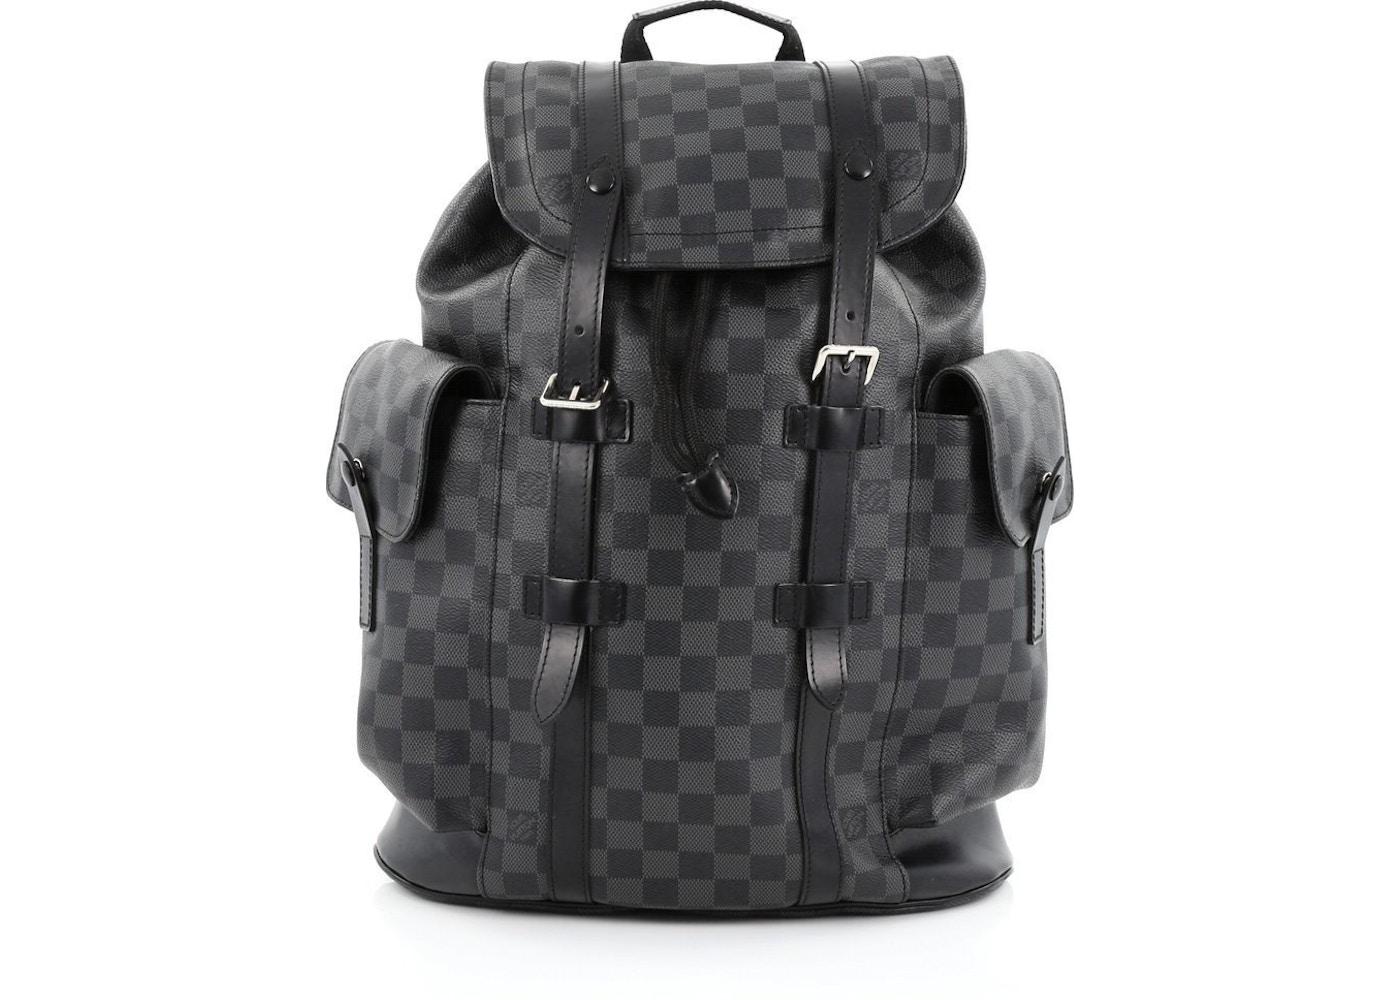 ddc2934bf4 Louis Vuitton Christopher Damier Graphite PM Black